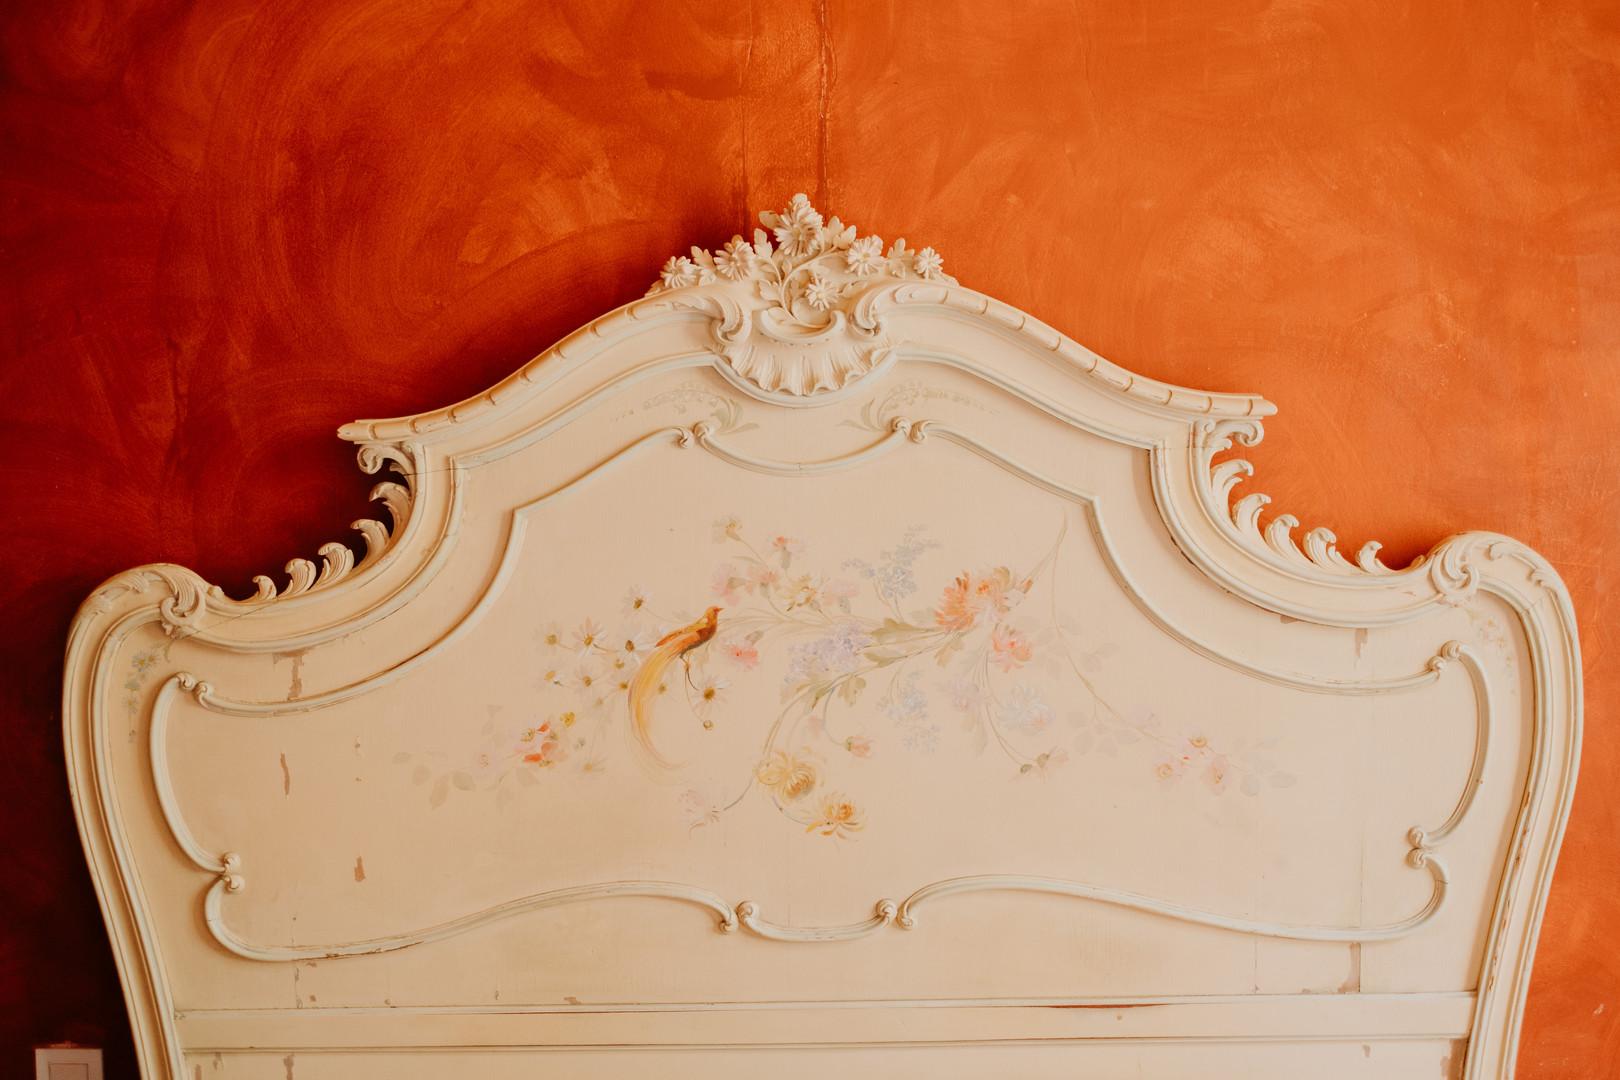 Domaine-du-petit-mylord-mariage-chambre.6.jpg